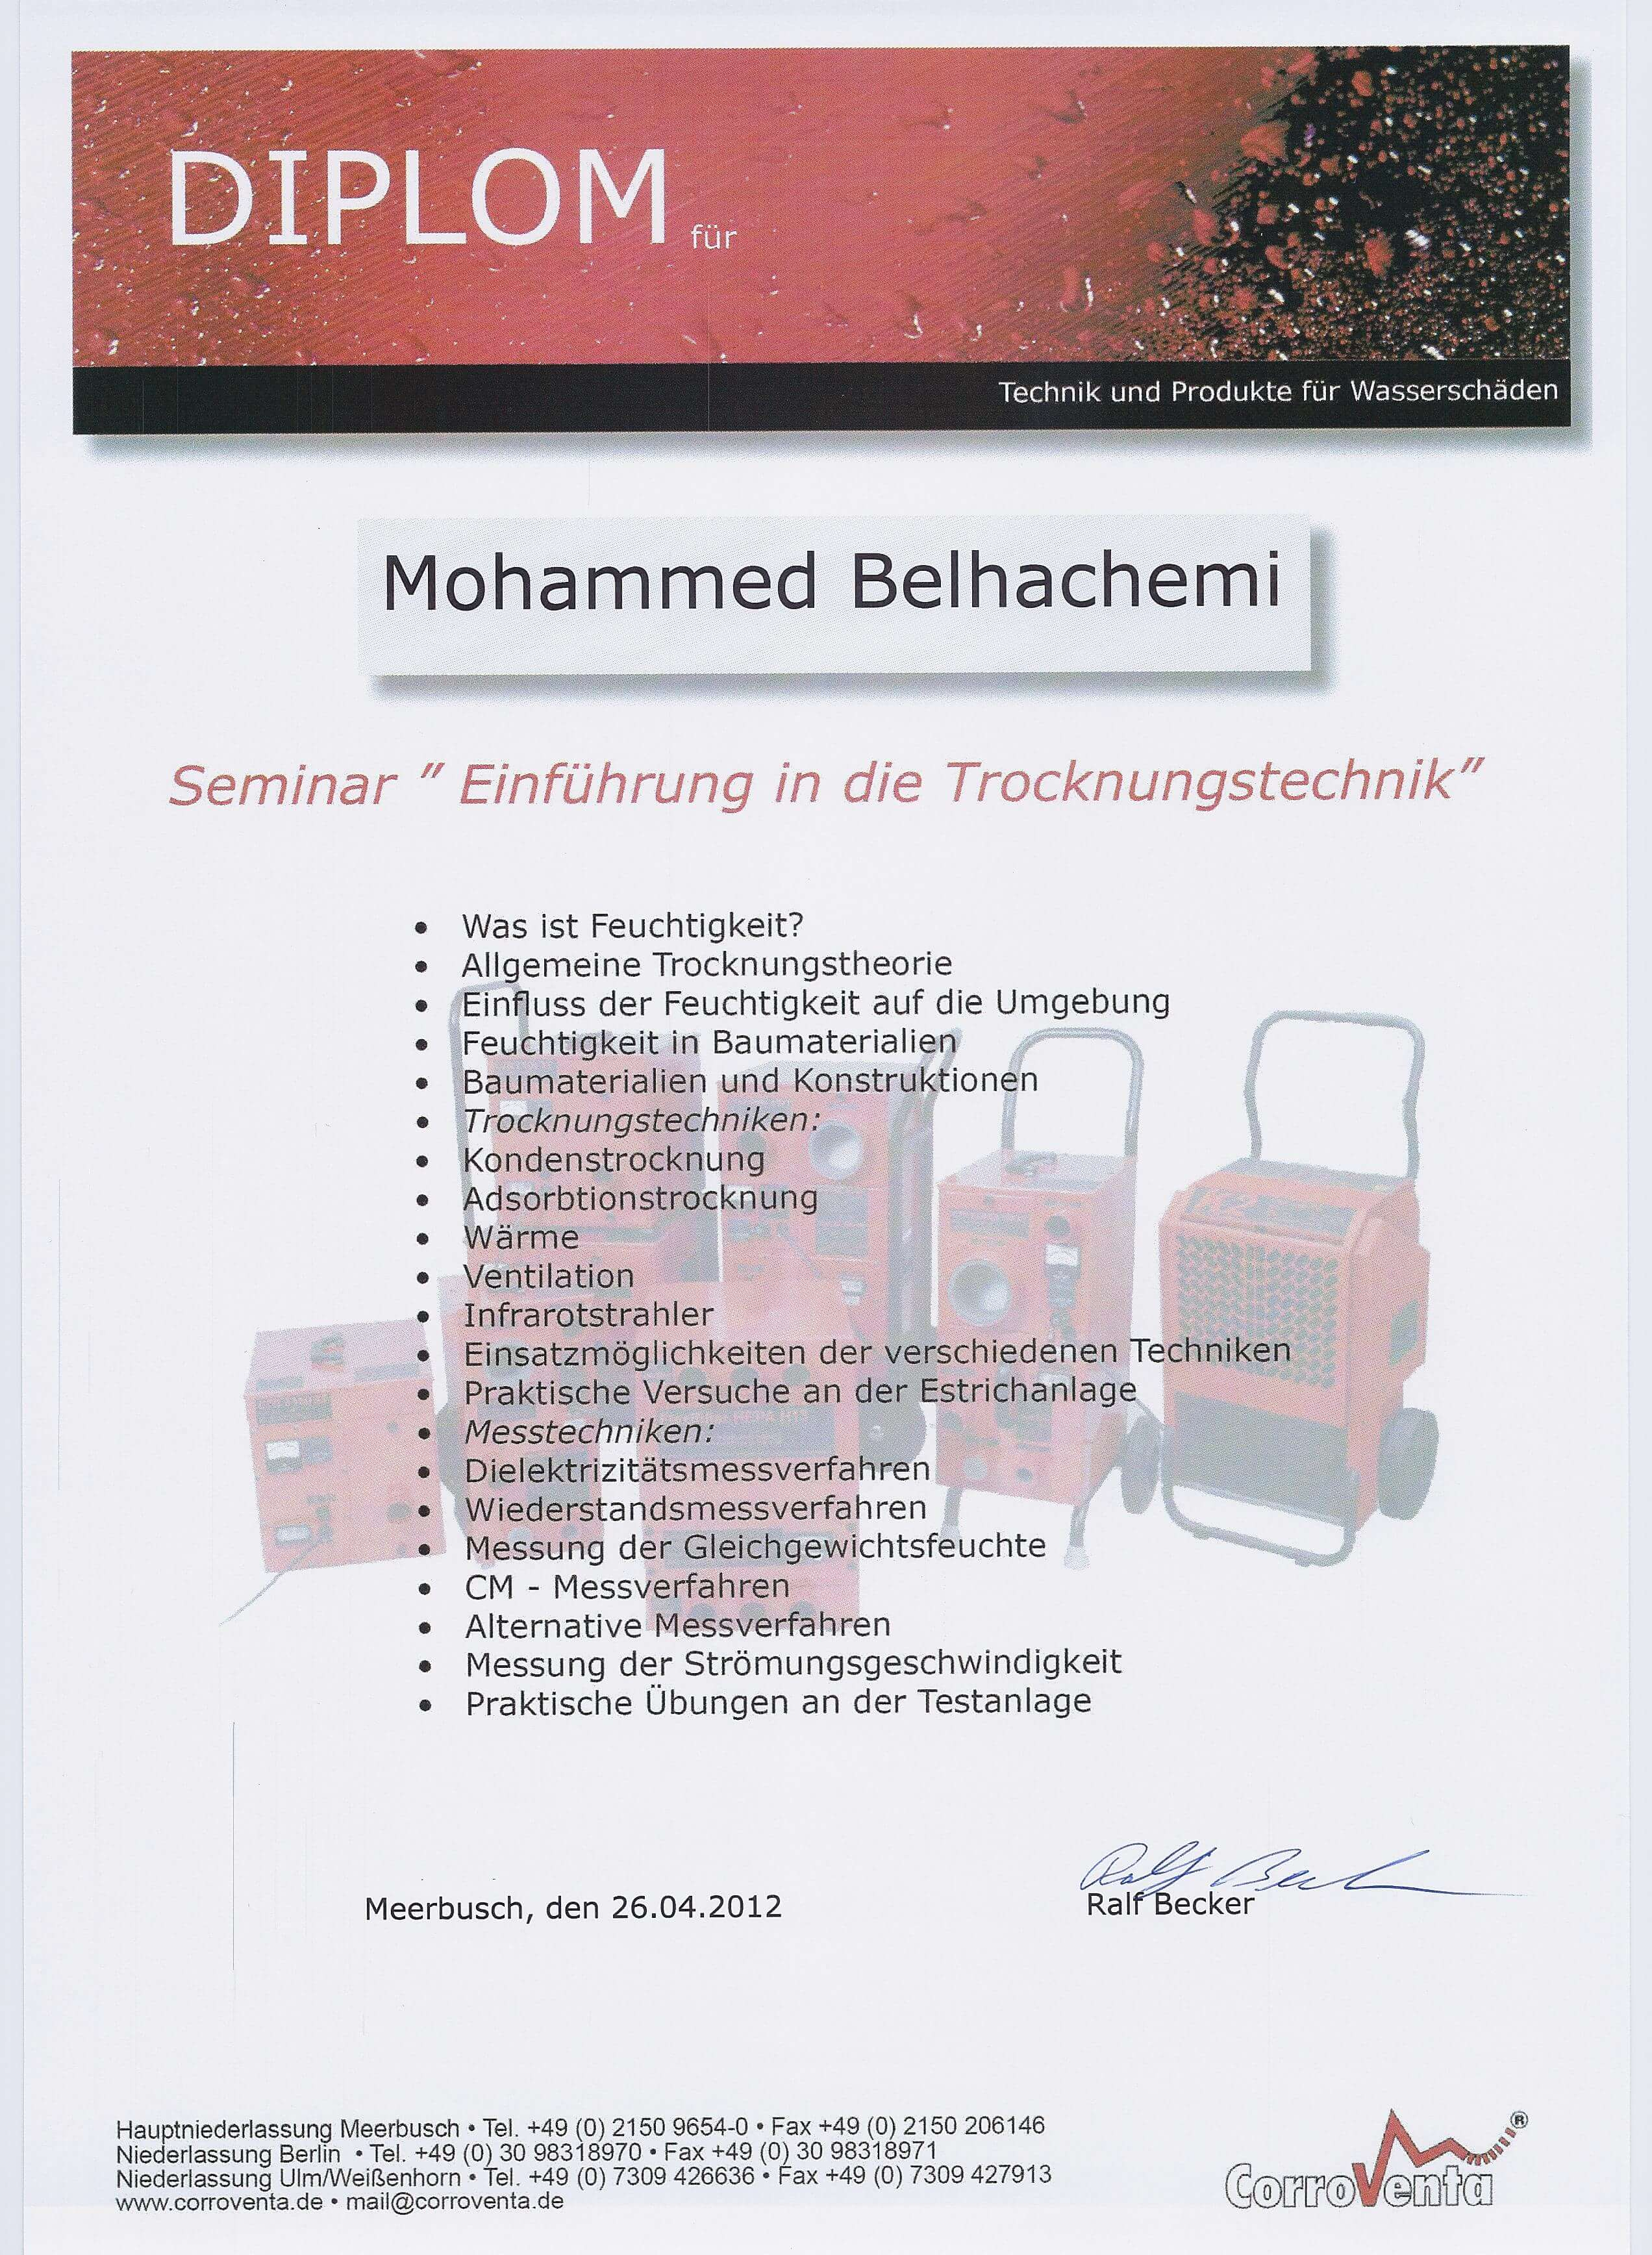 Diplom Einführung in die Trocknungstechniks Mohammed Belhachemi